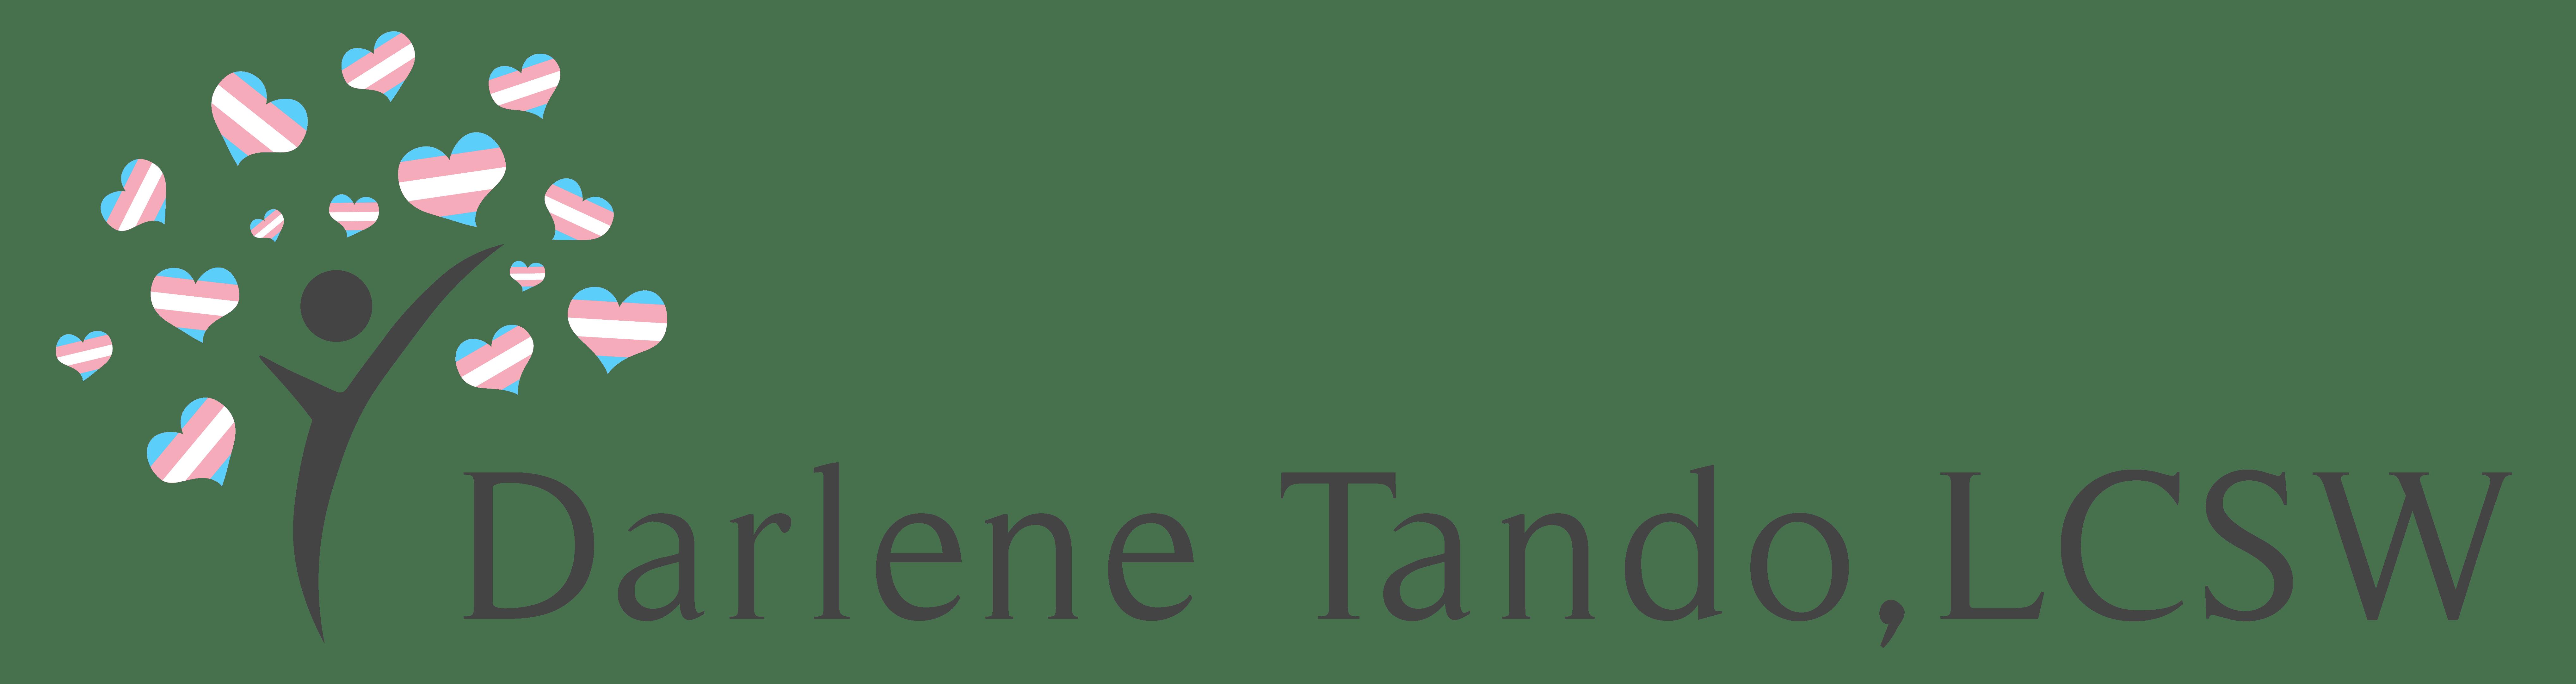 darlene-logo